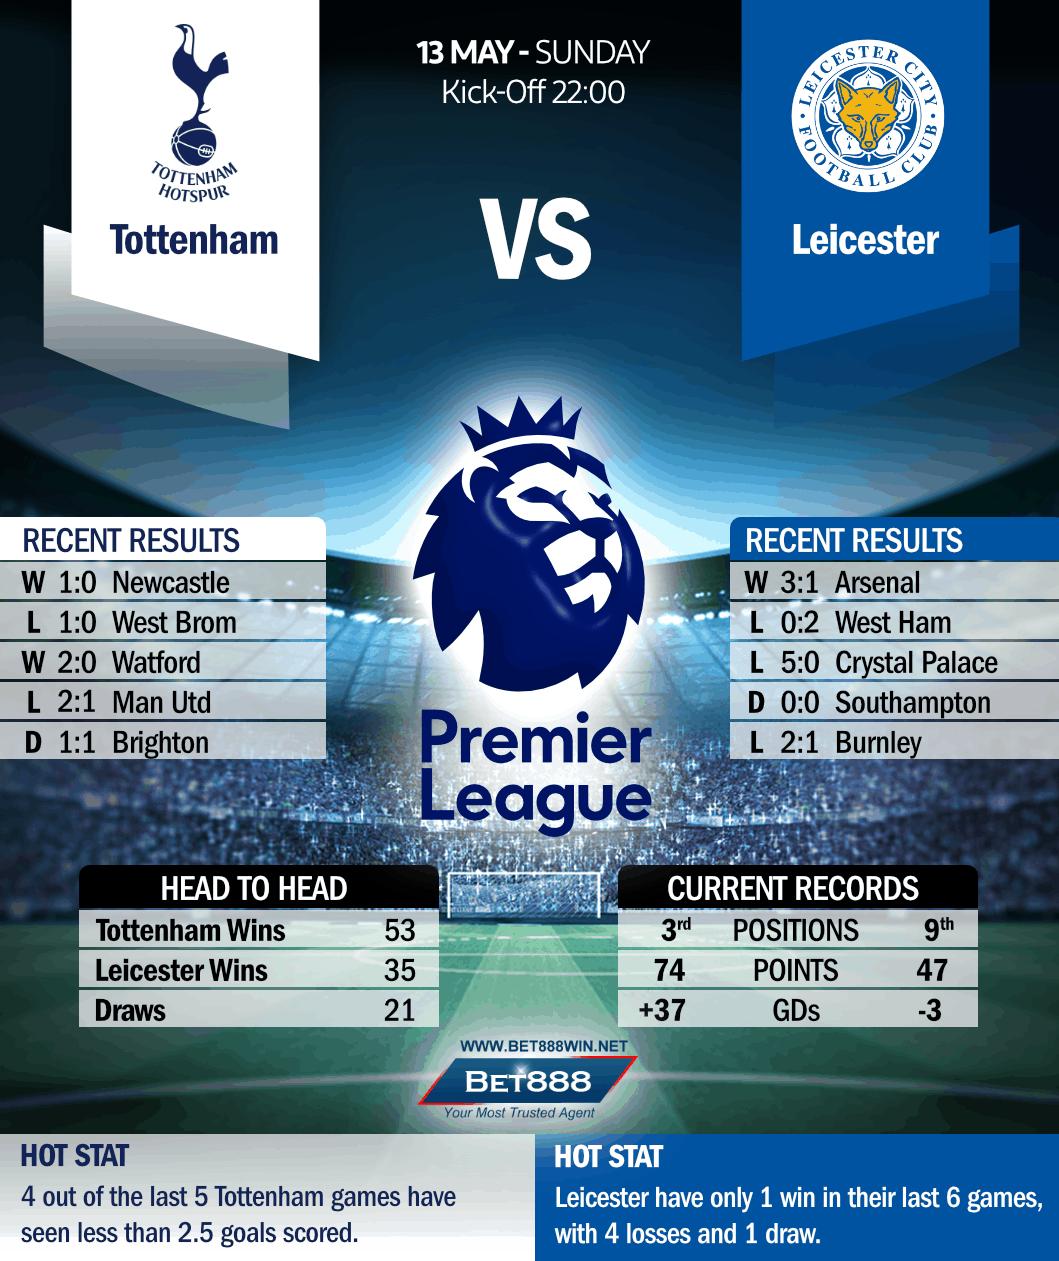 Tottenham Hotspur vs Leicester City 13/05/18